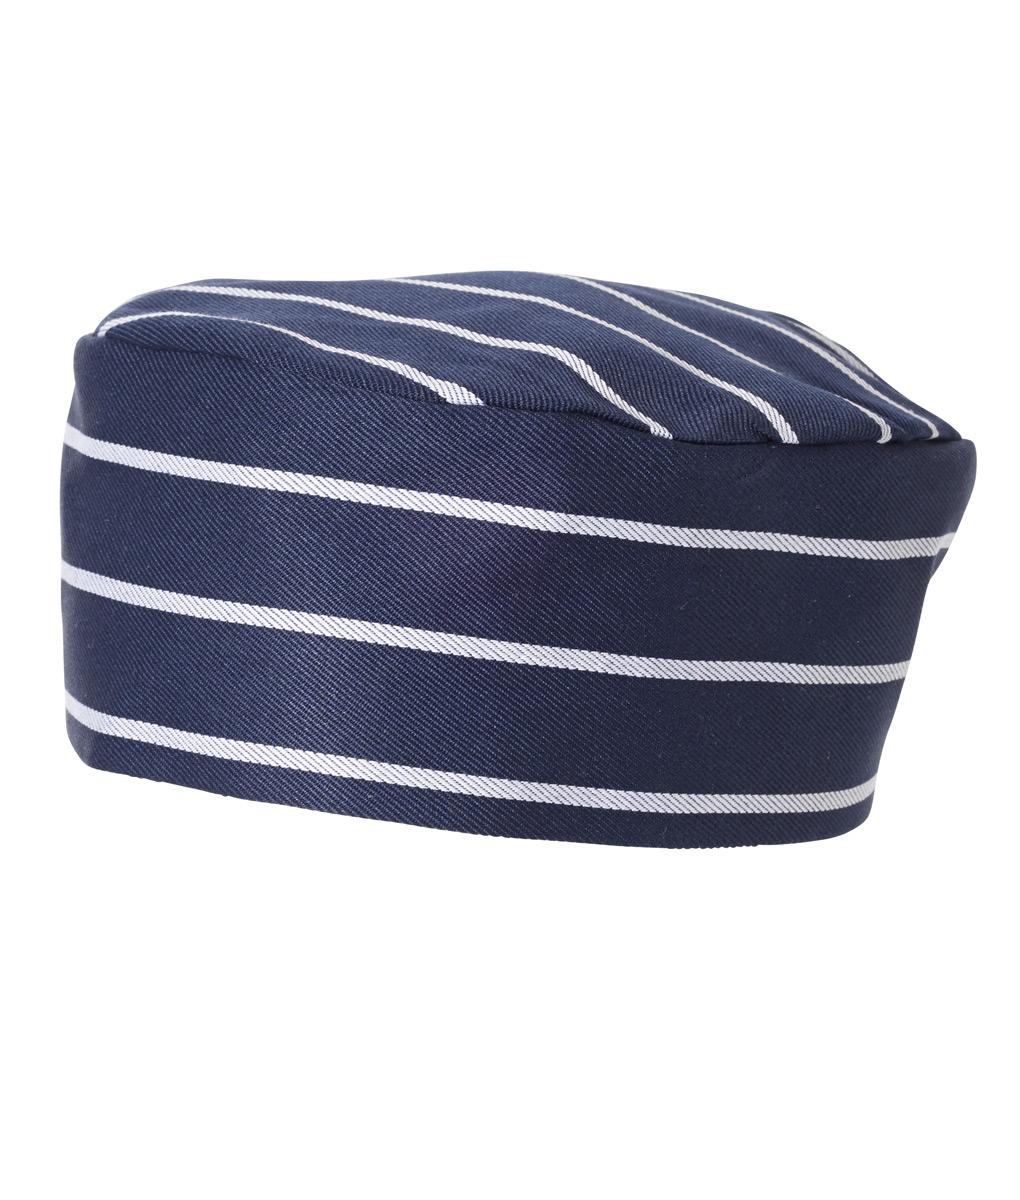 Flat Top Hat Pinstripe by Club Chef Chef Uniforms 5